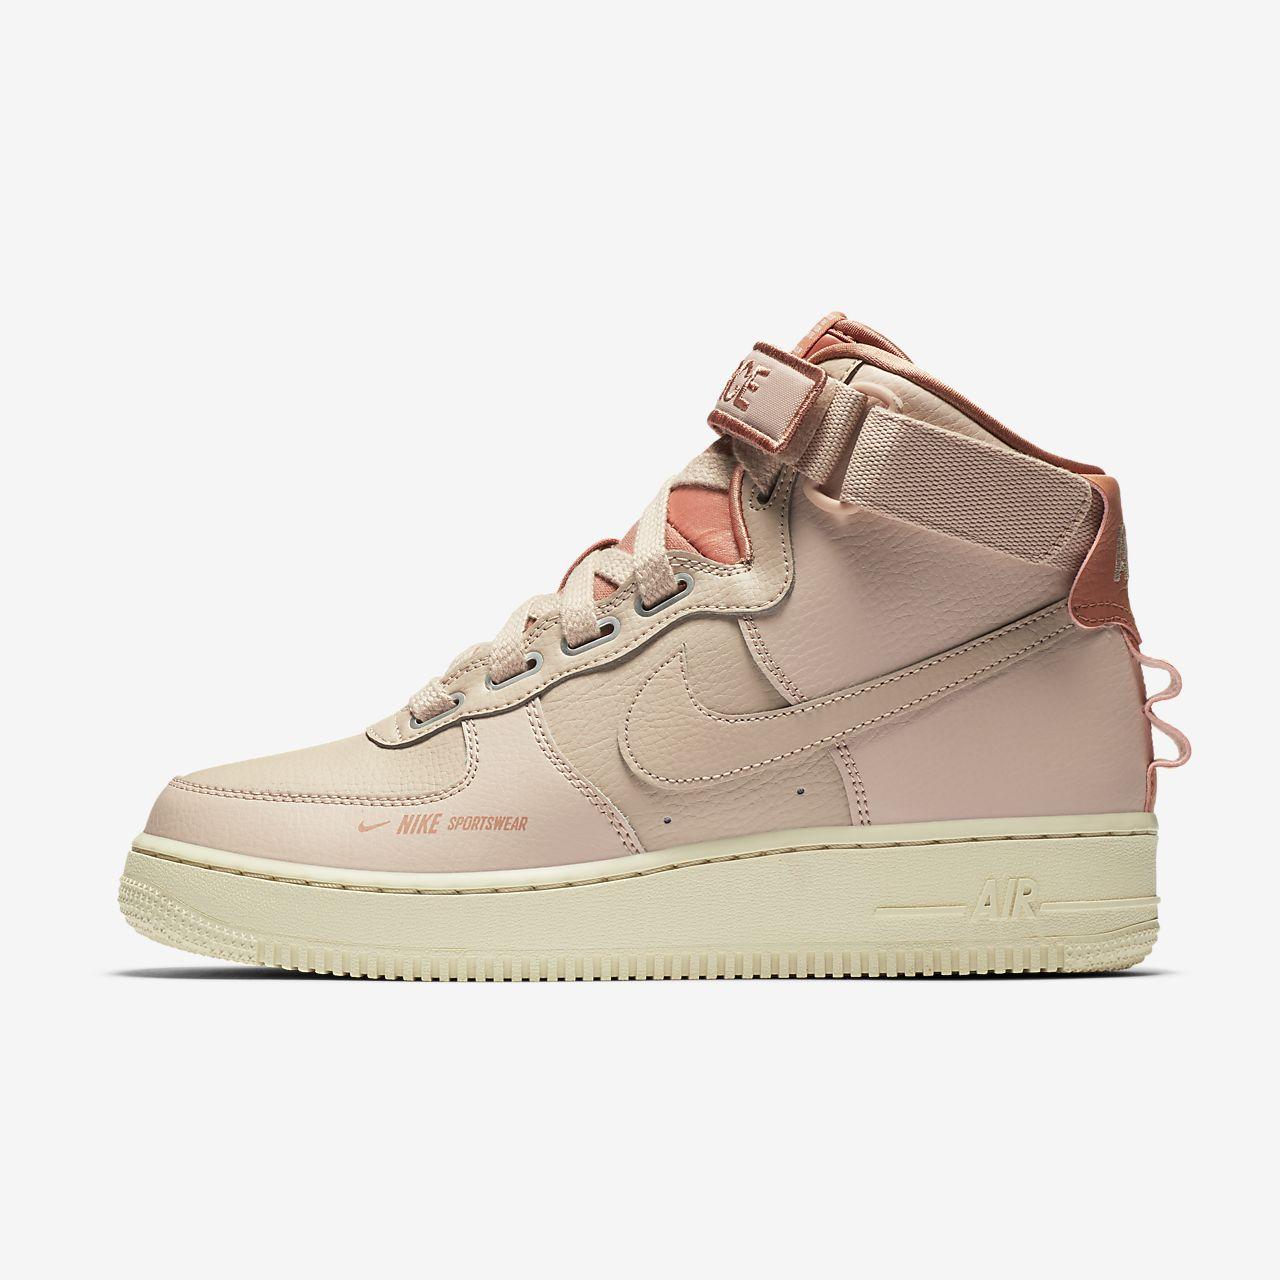 b07ea8419669e9 Nike Air Force 1 High Utility Women s Shoe. Nike.com GB